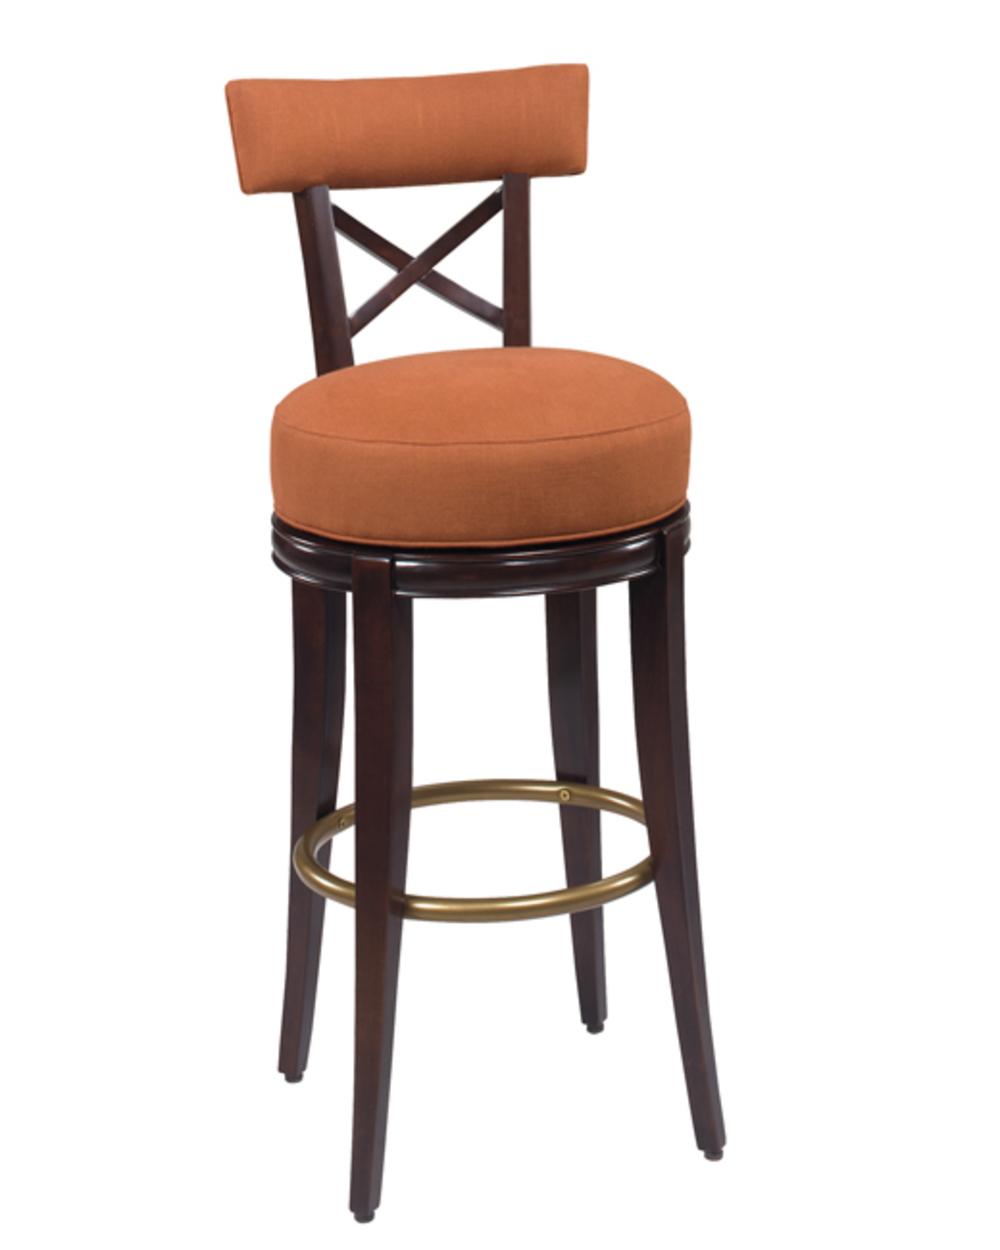 Designmaster Furniture - Dahlia Bar Stool